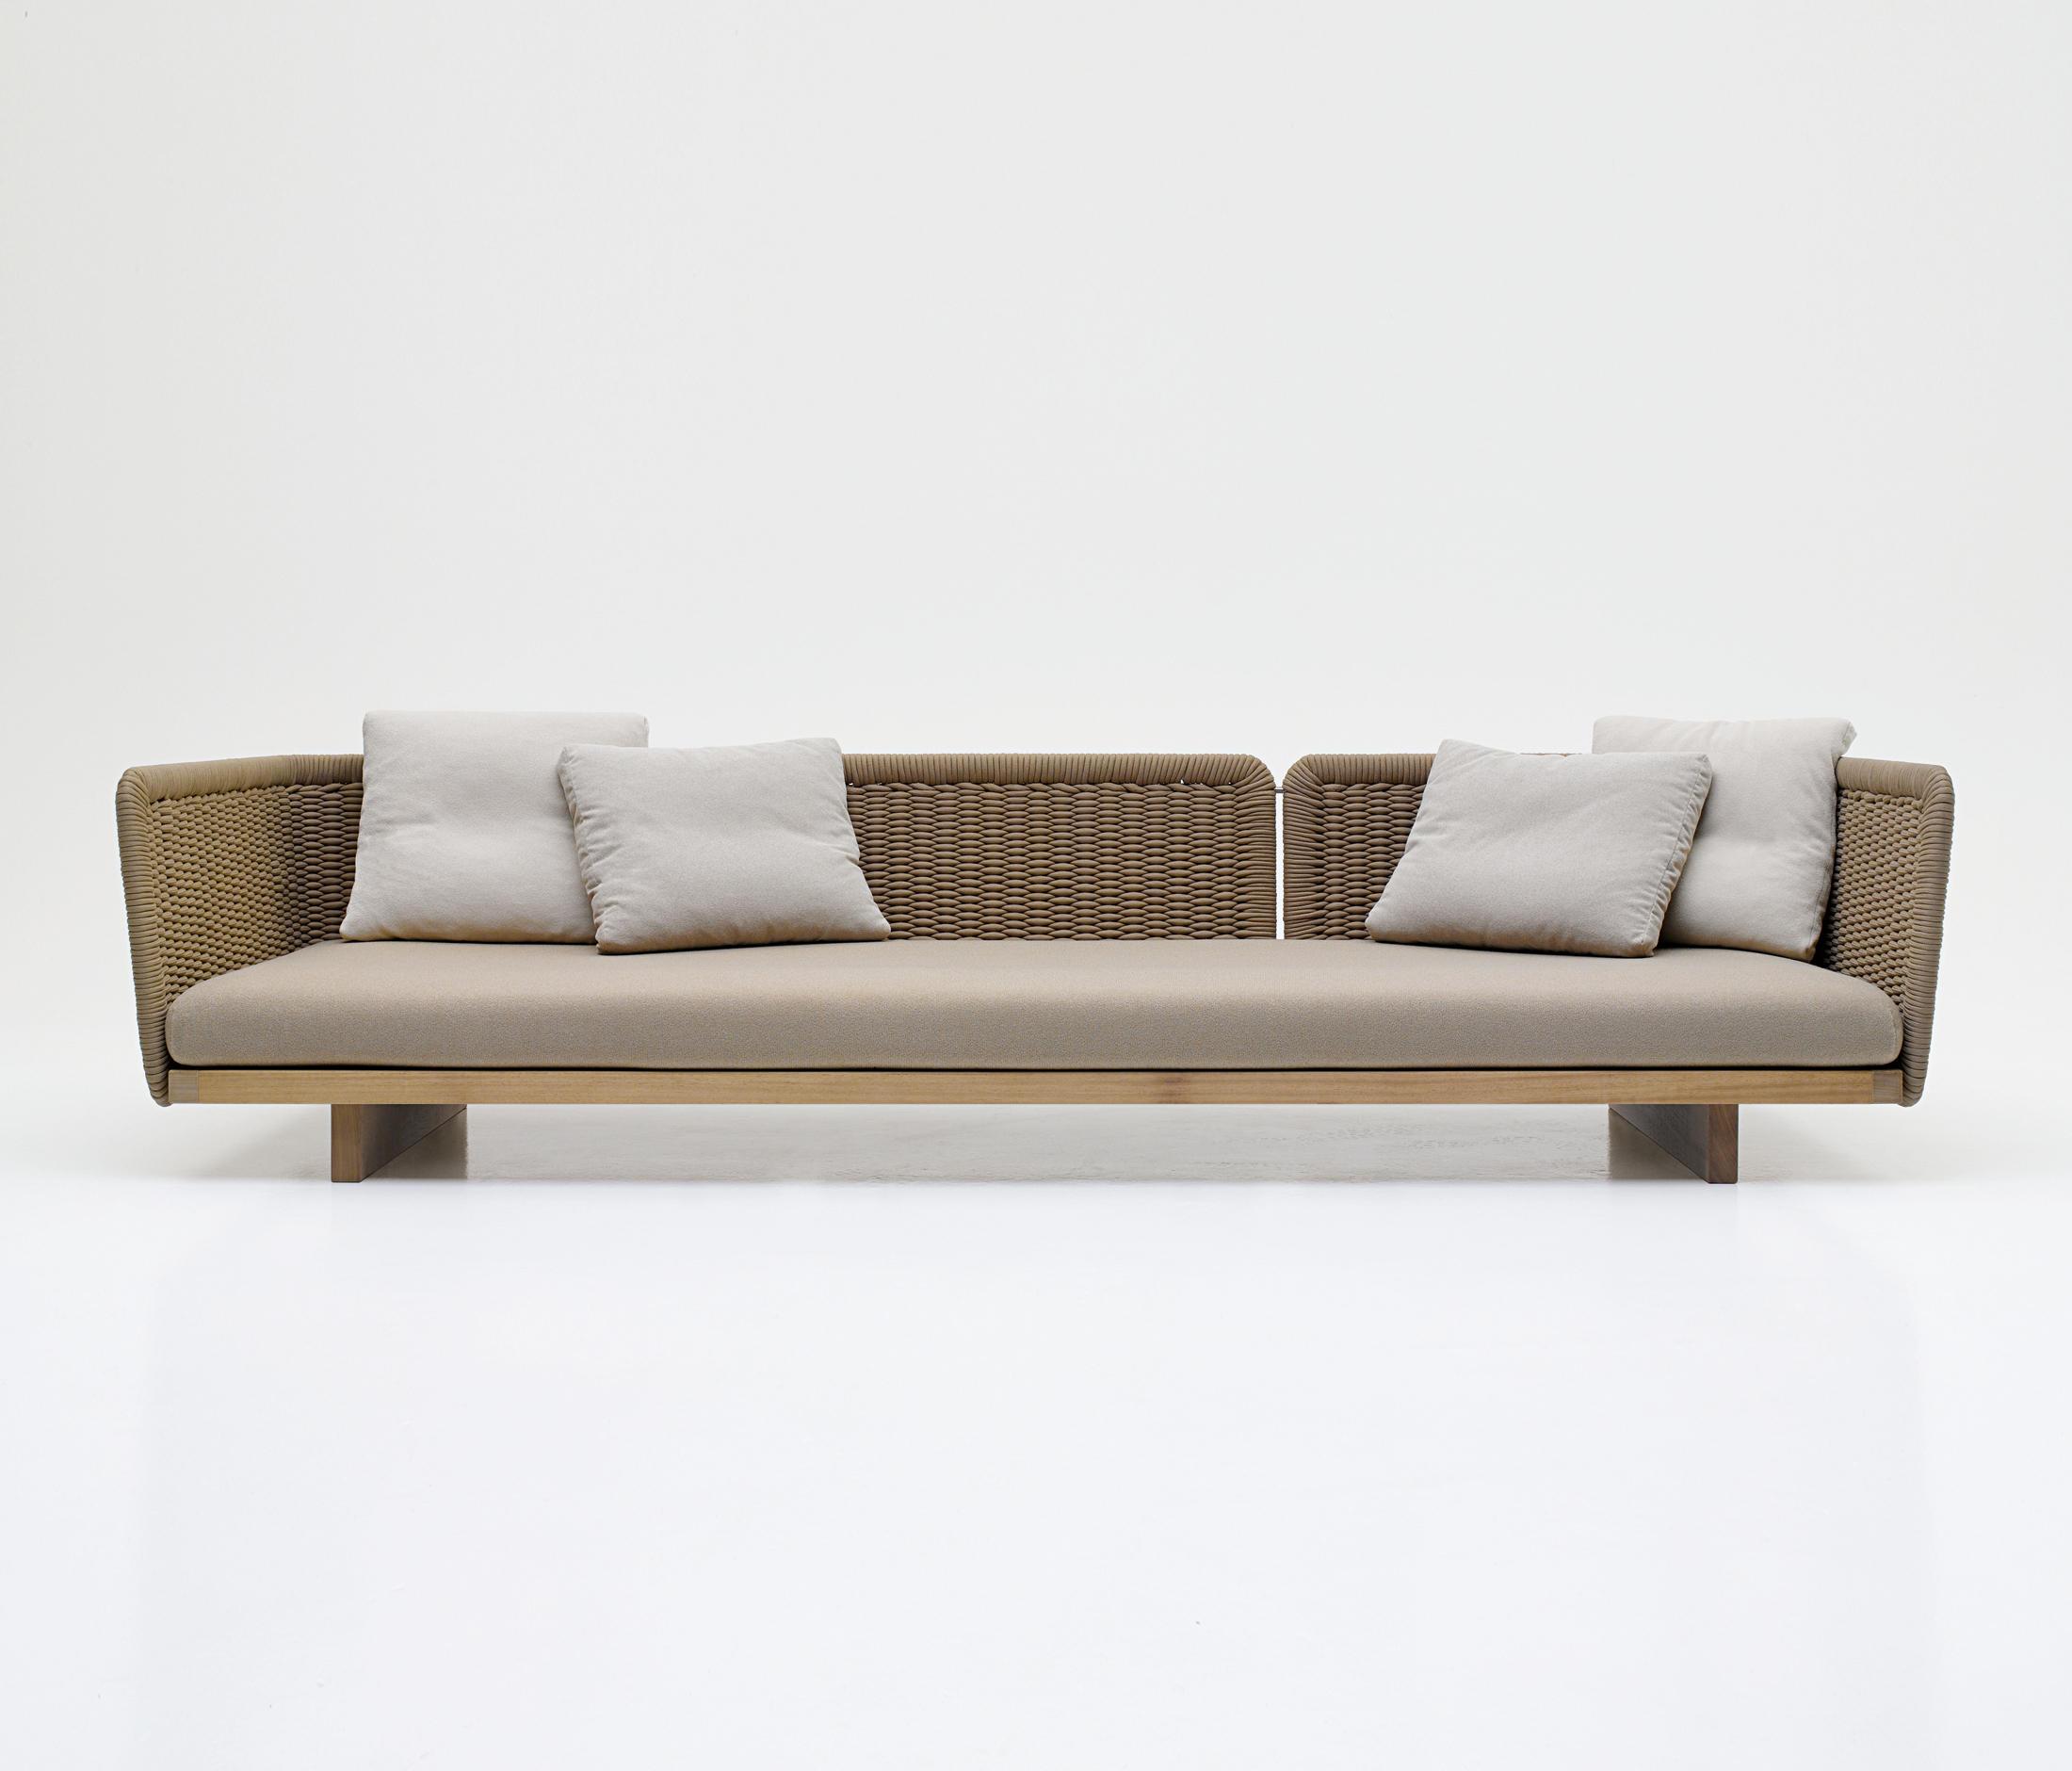 sabi garden sofas from paola lenti architonic. Black Bedroom Furniture Sets. Home Design Ideas